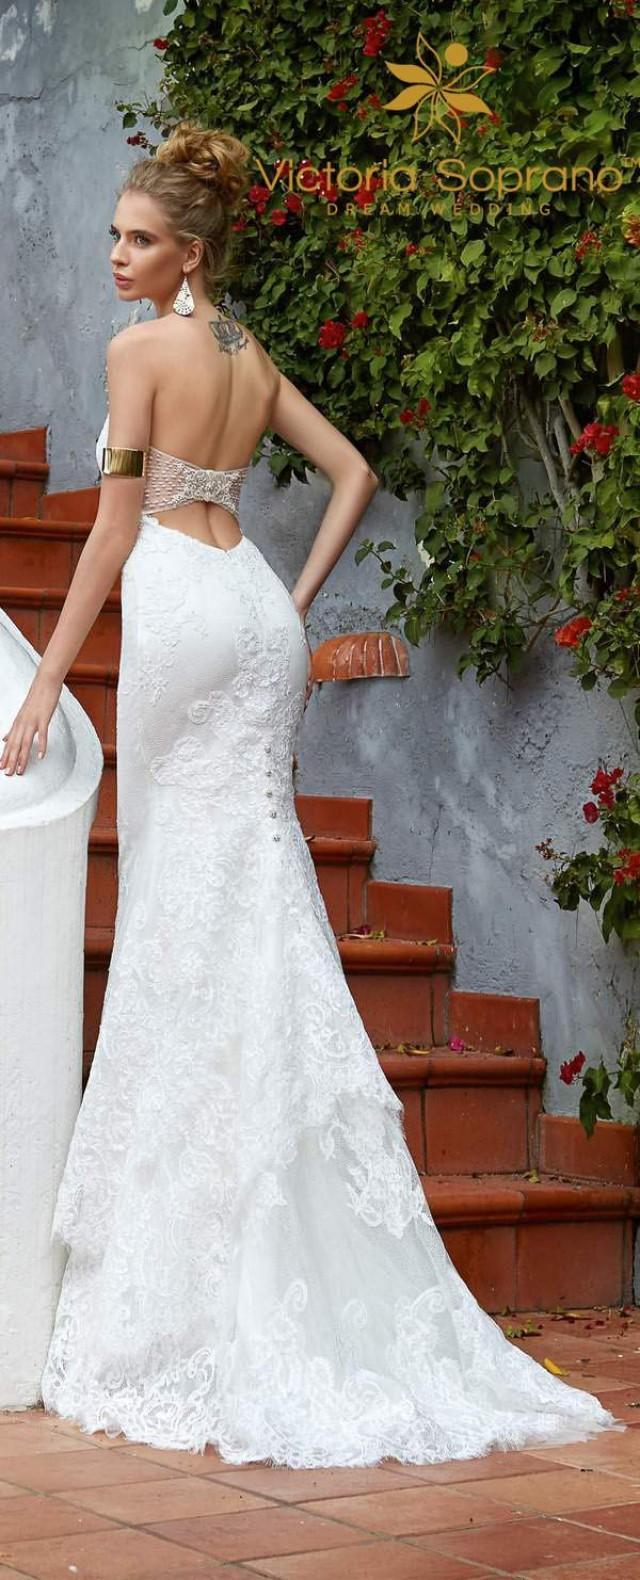 wedding photo - Victoria Soprano 2017 Wedding Dresses Collection – CAPRI